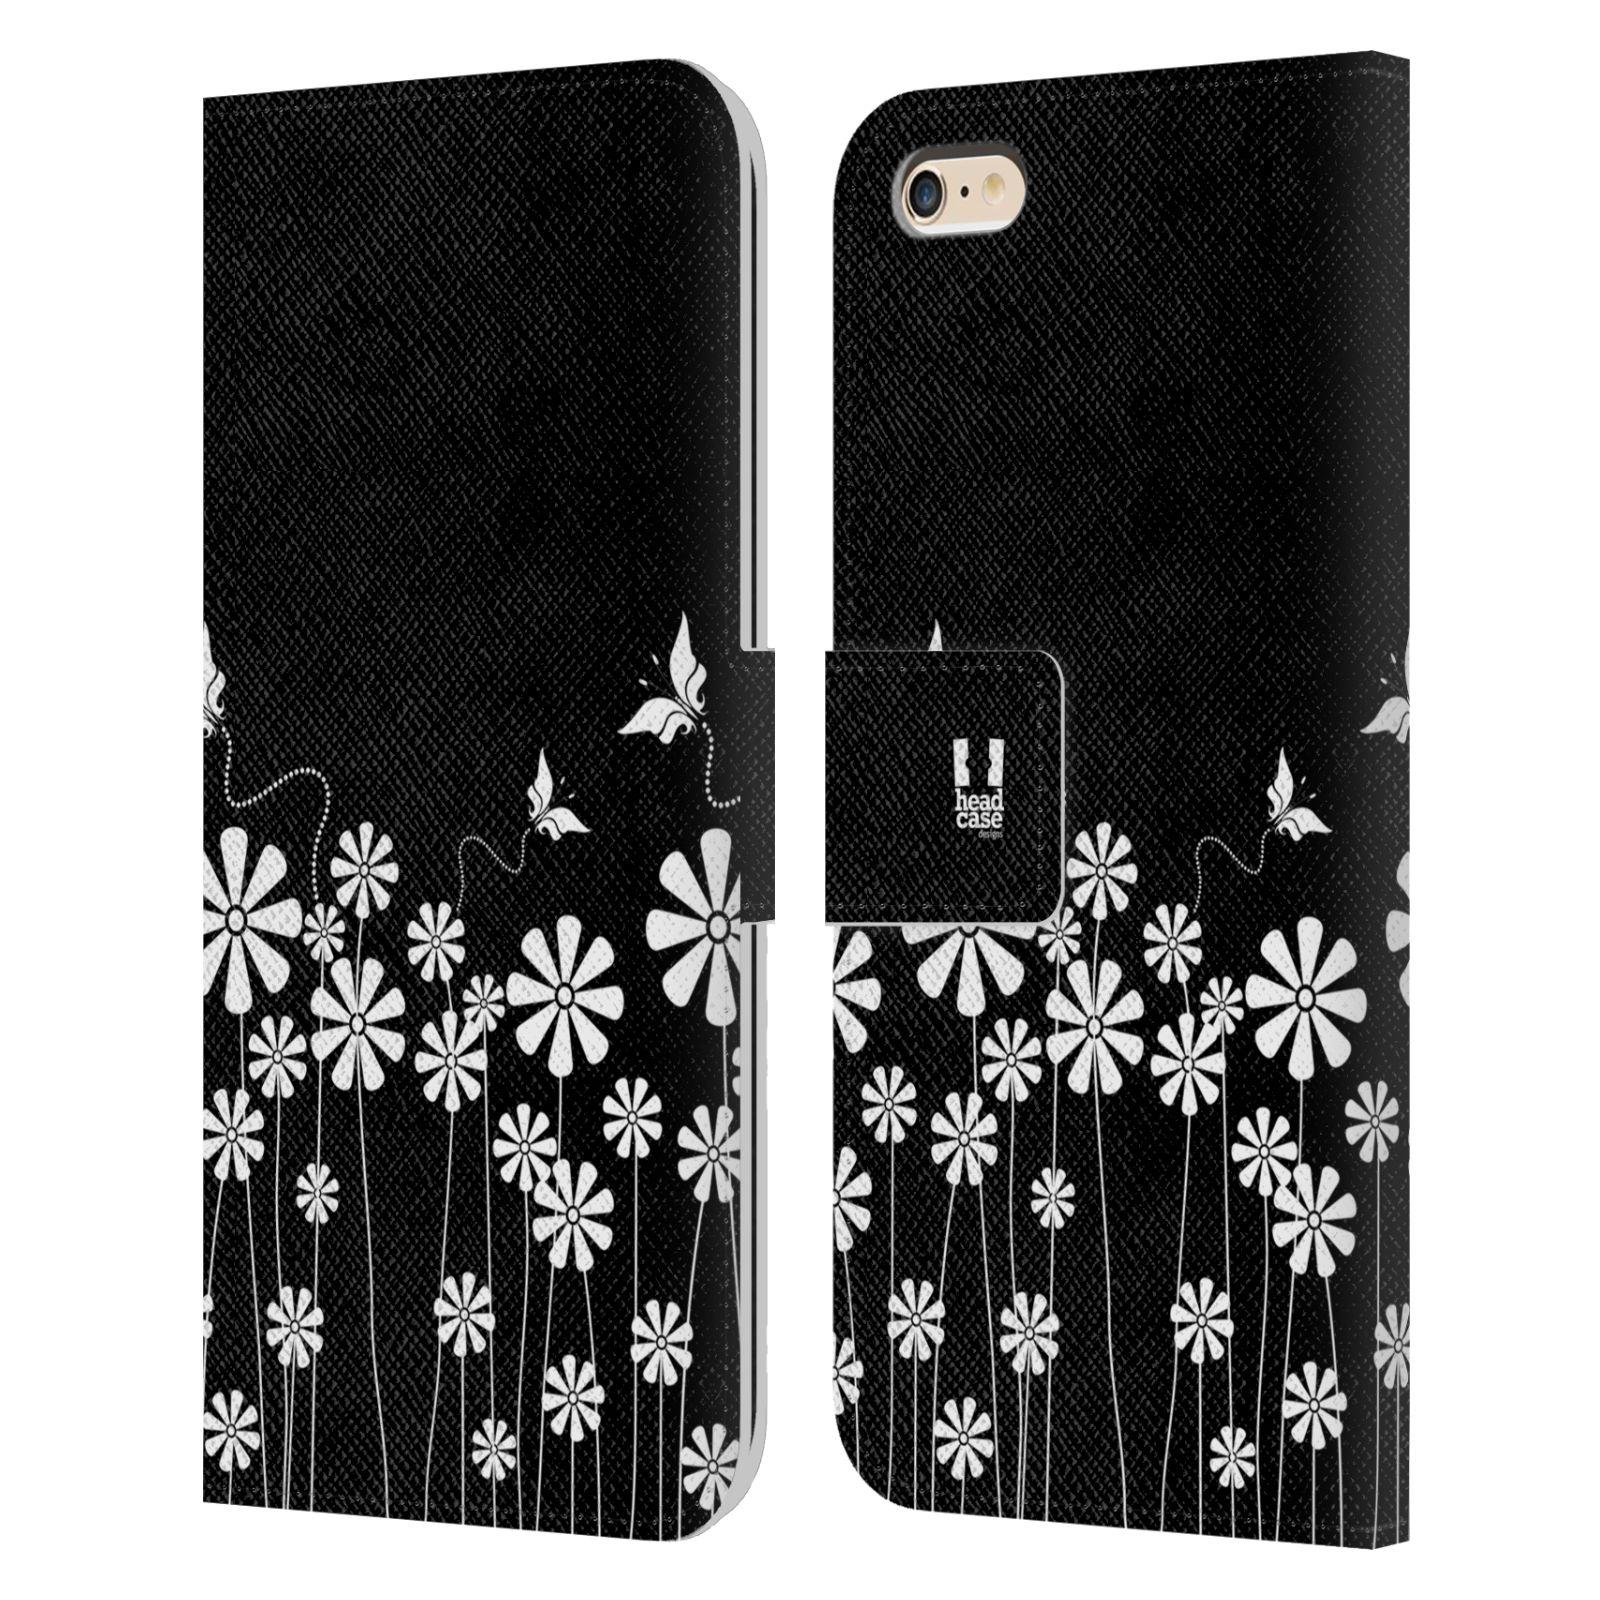 HEAD CASE Flipové pouzdro pro mobil Apple Iphone 6 PLUS / 6S PLUS ČERNOBÍLÁ KVĚTINA motýl